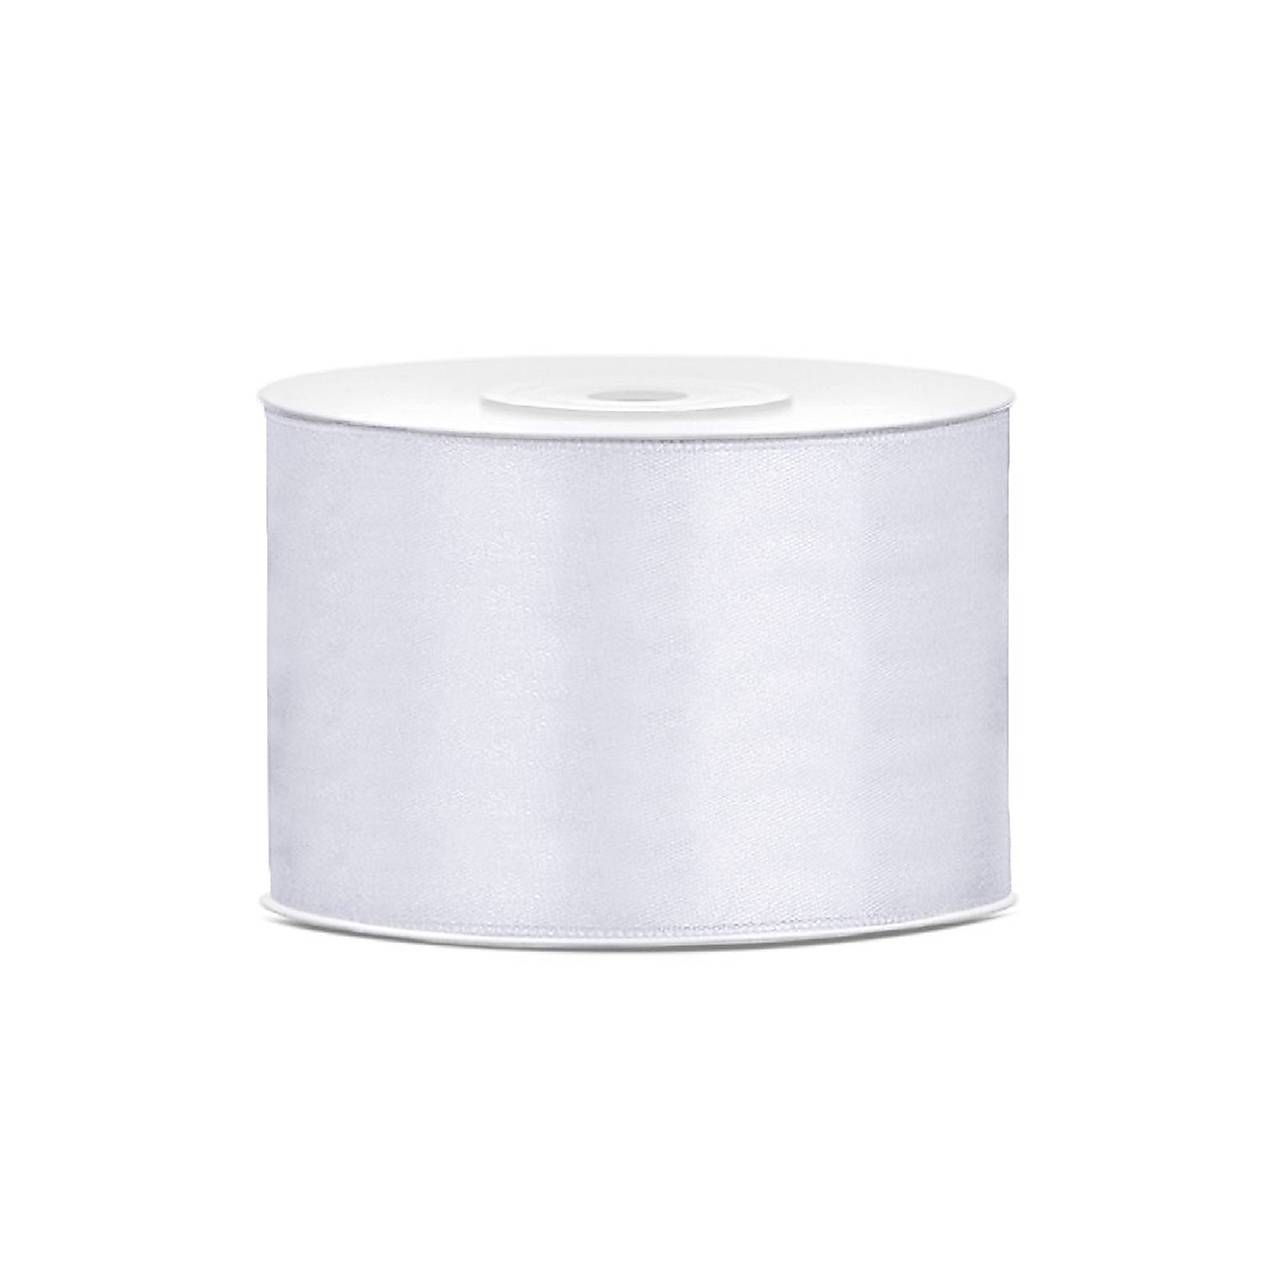 saténová stuha 38 mm biela - Obrázok č. 1